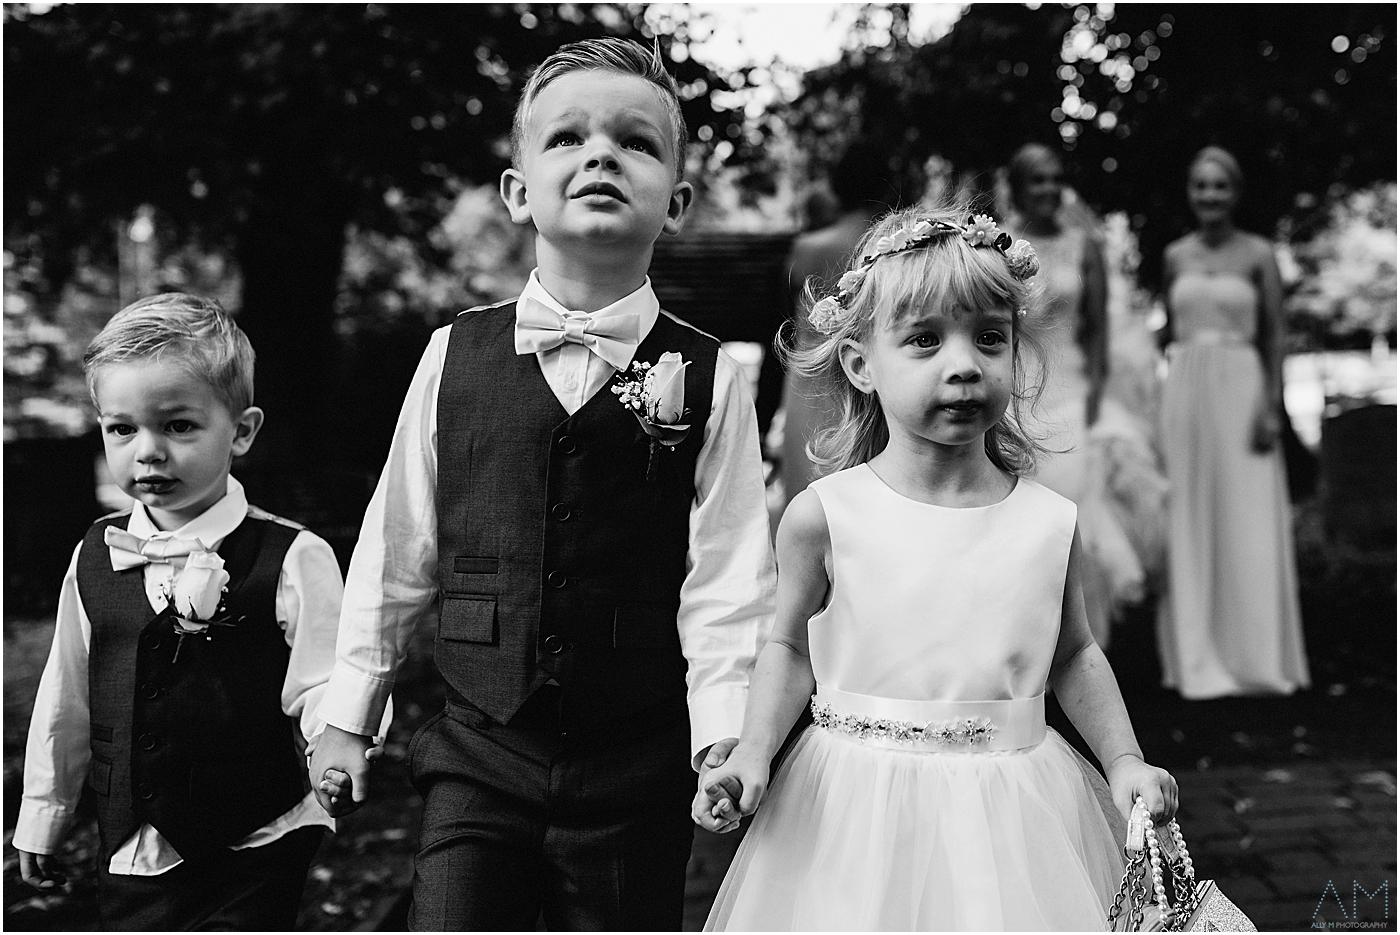 three children making their way to the church